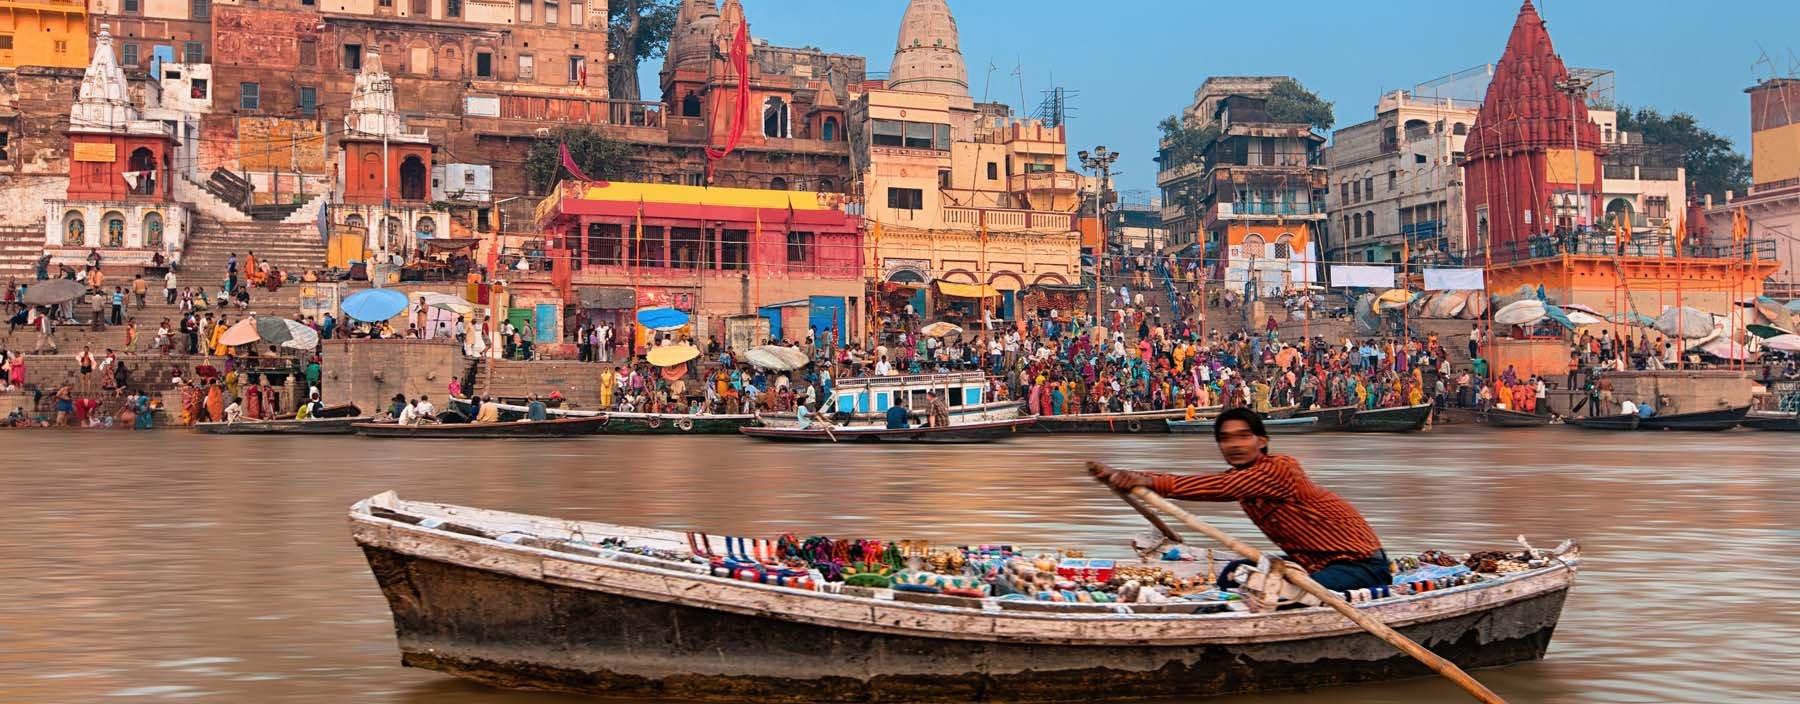 in, varanasi, a view of holy ghats.jpg